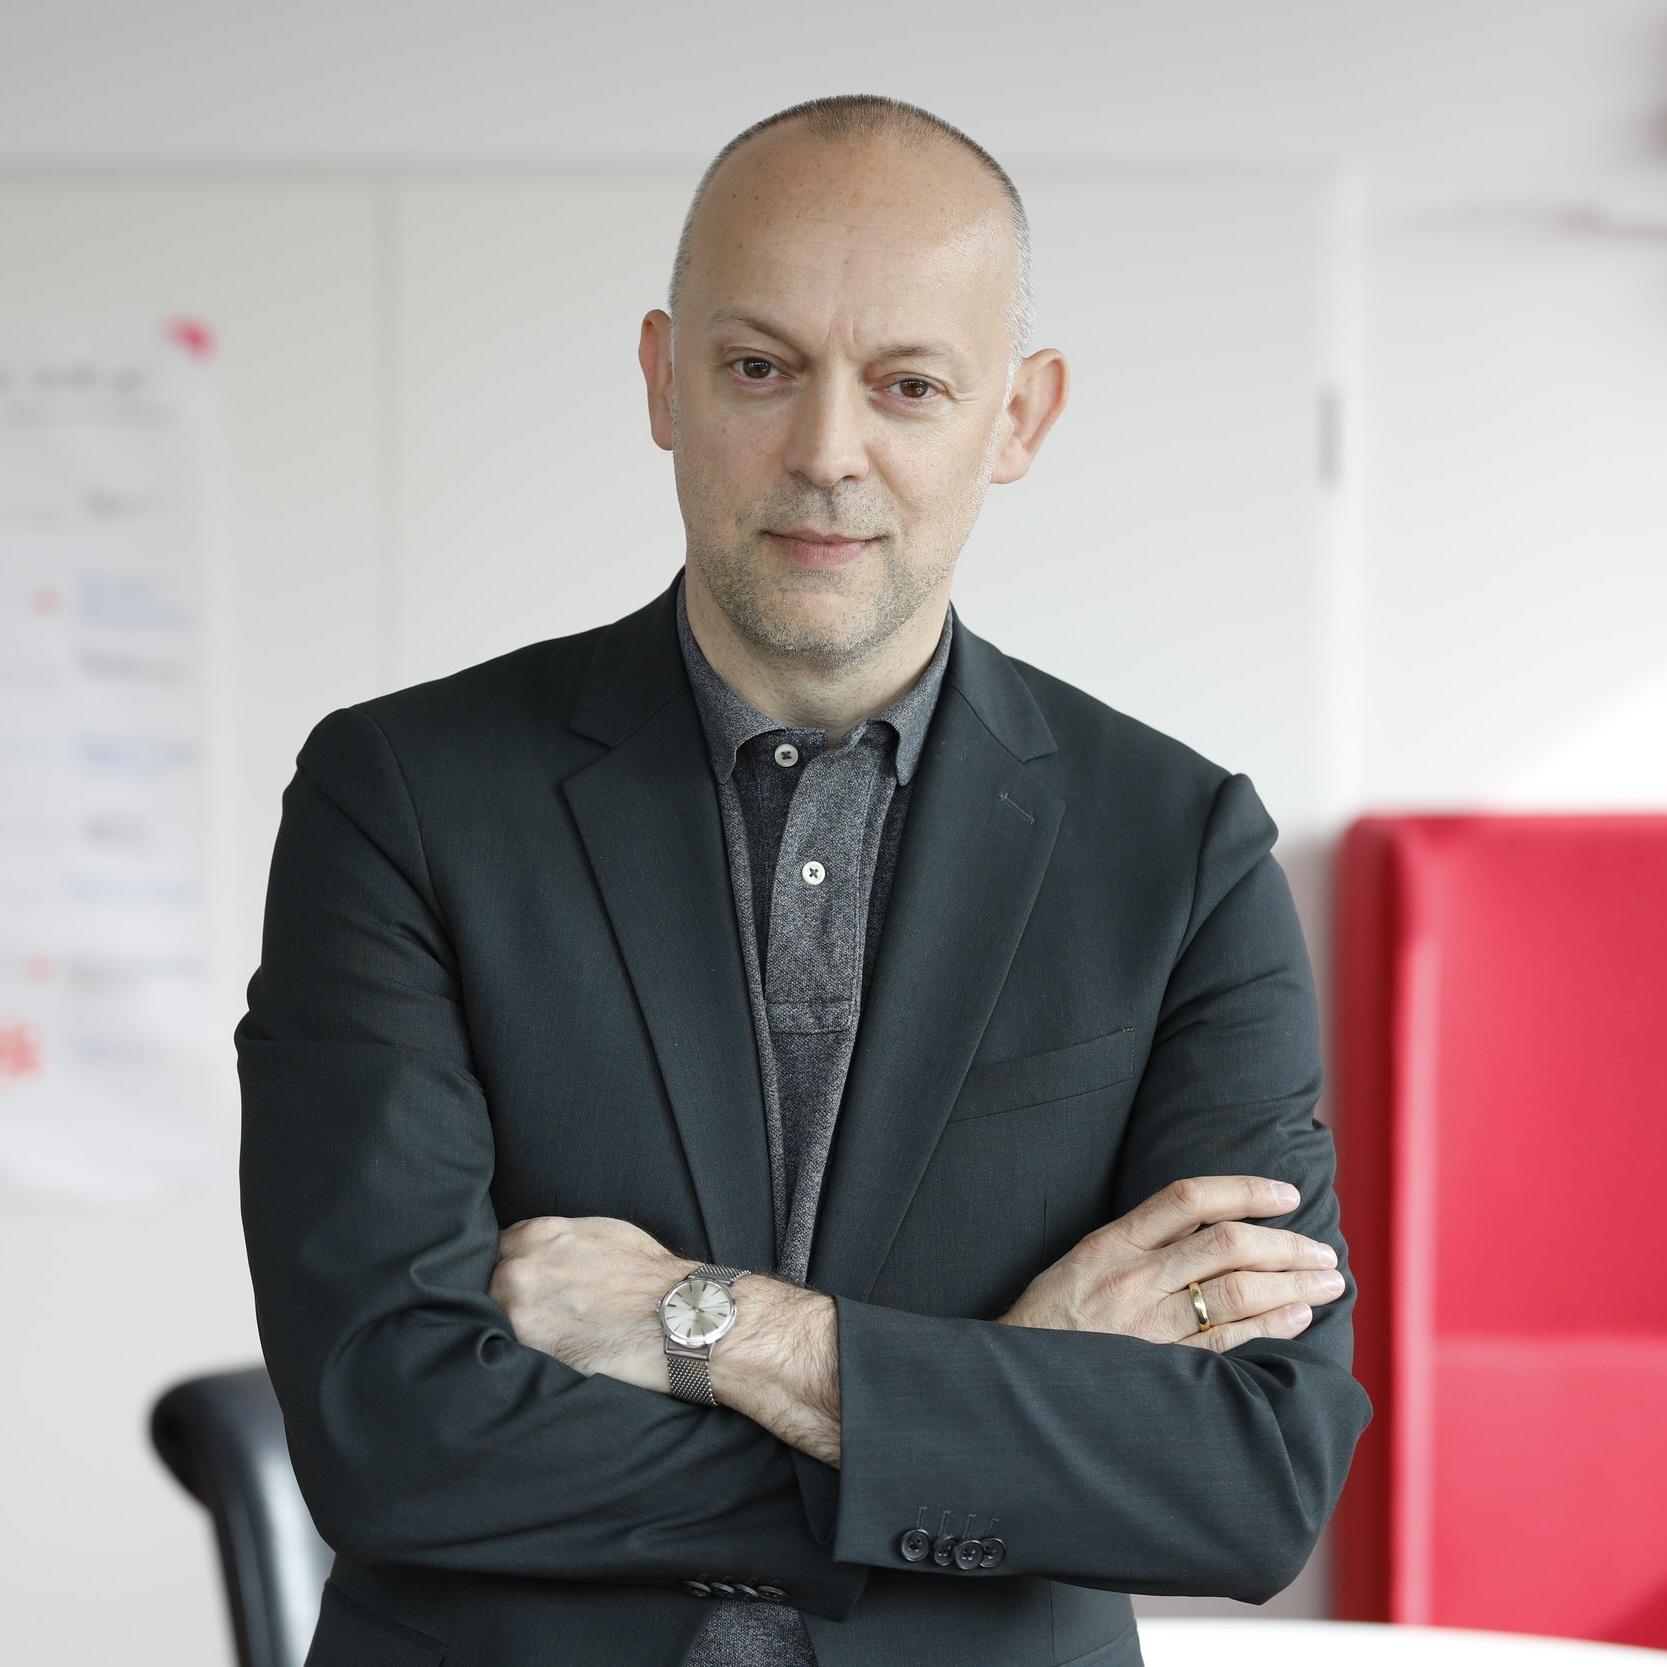 Stephan Balzer - Co-Founder, Boma Global   European Ambassador, TEDx   Curator & Managing Director, SingularityU Germany Summit   Curator, Q Berlin Questions